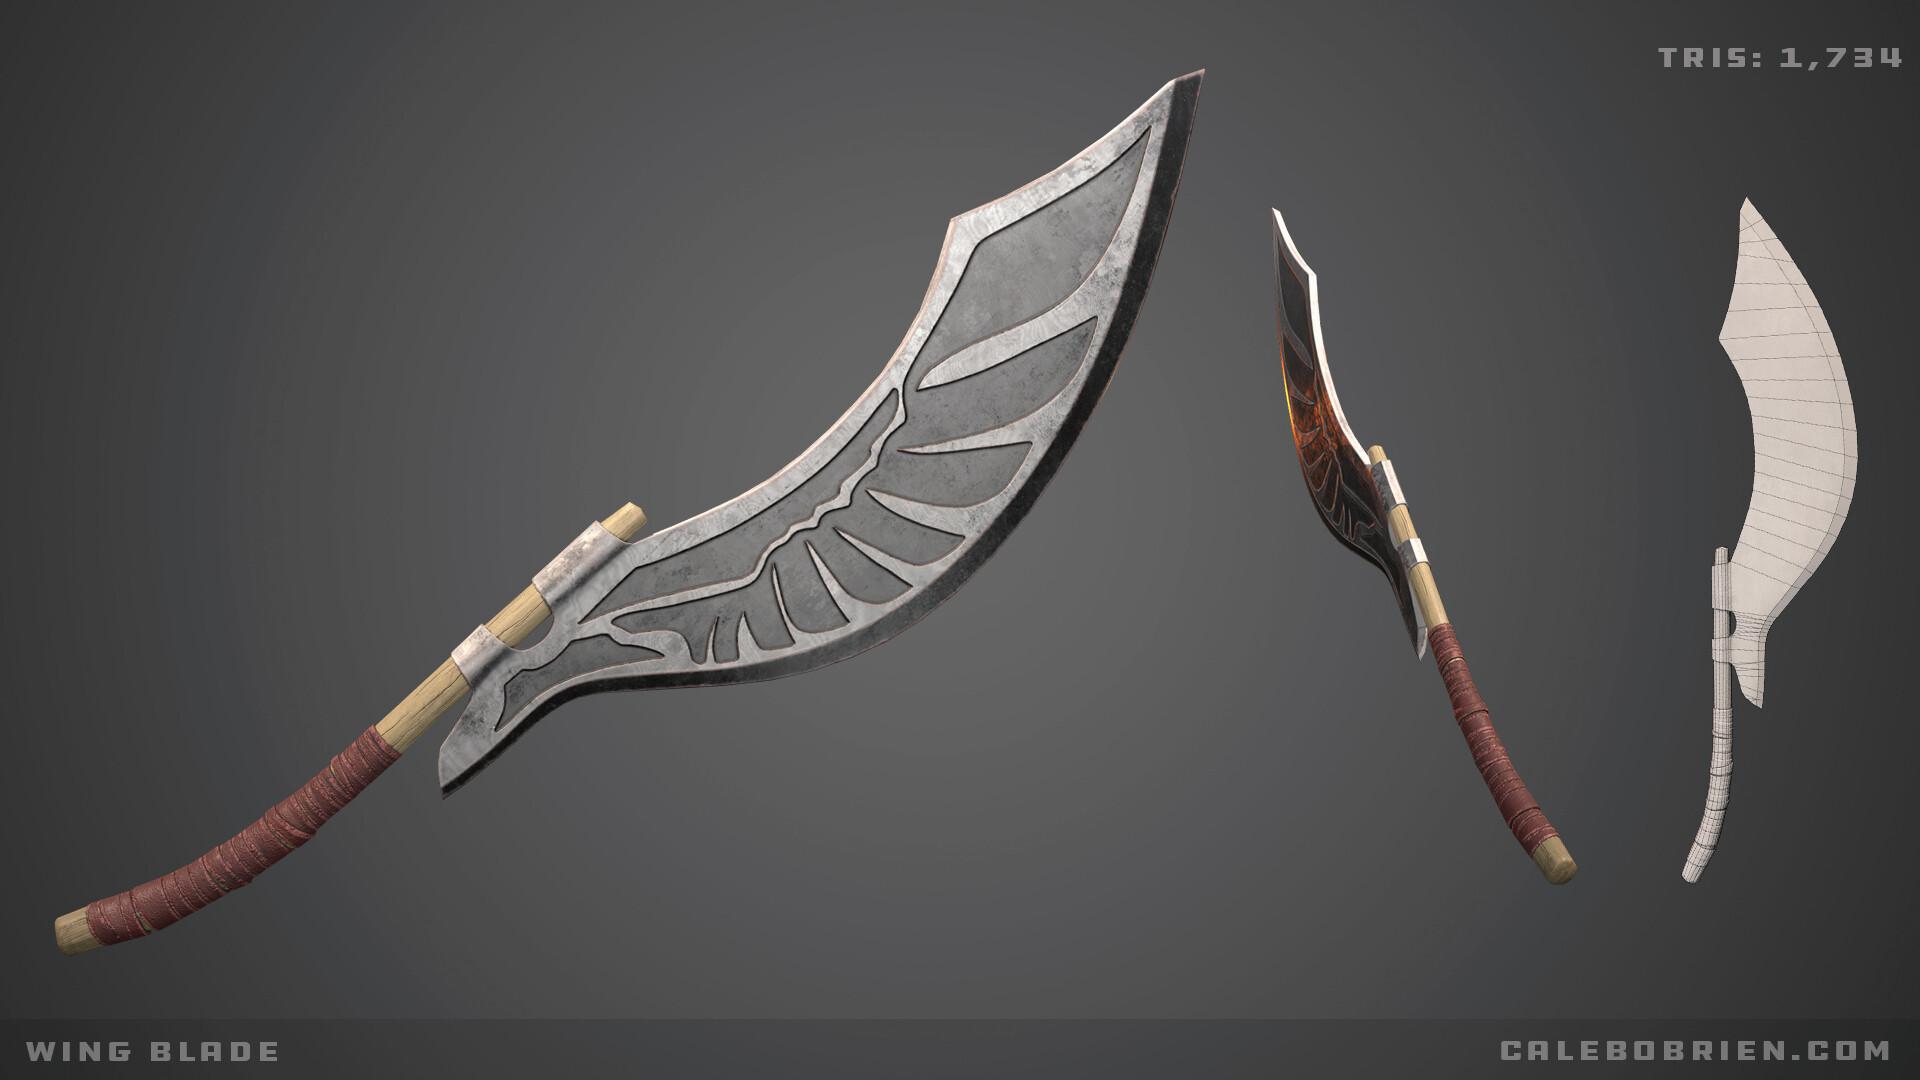 Caleb o brien wing blade